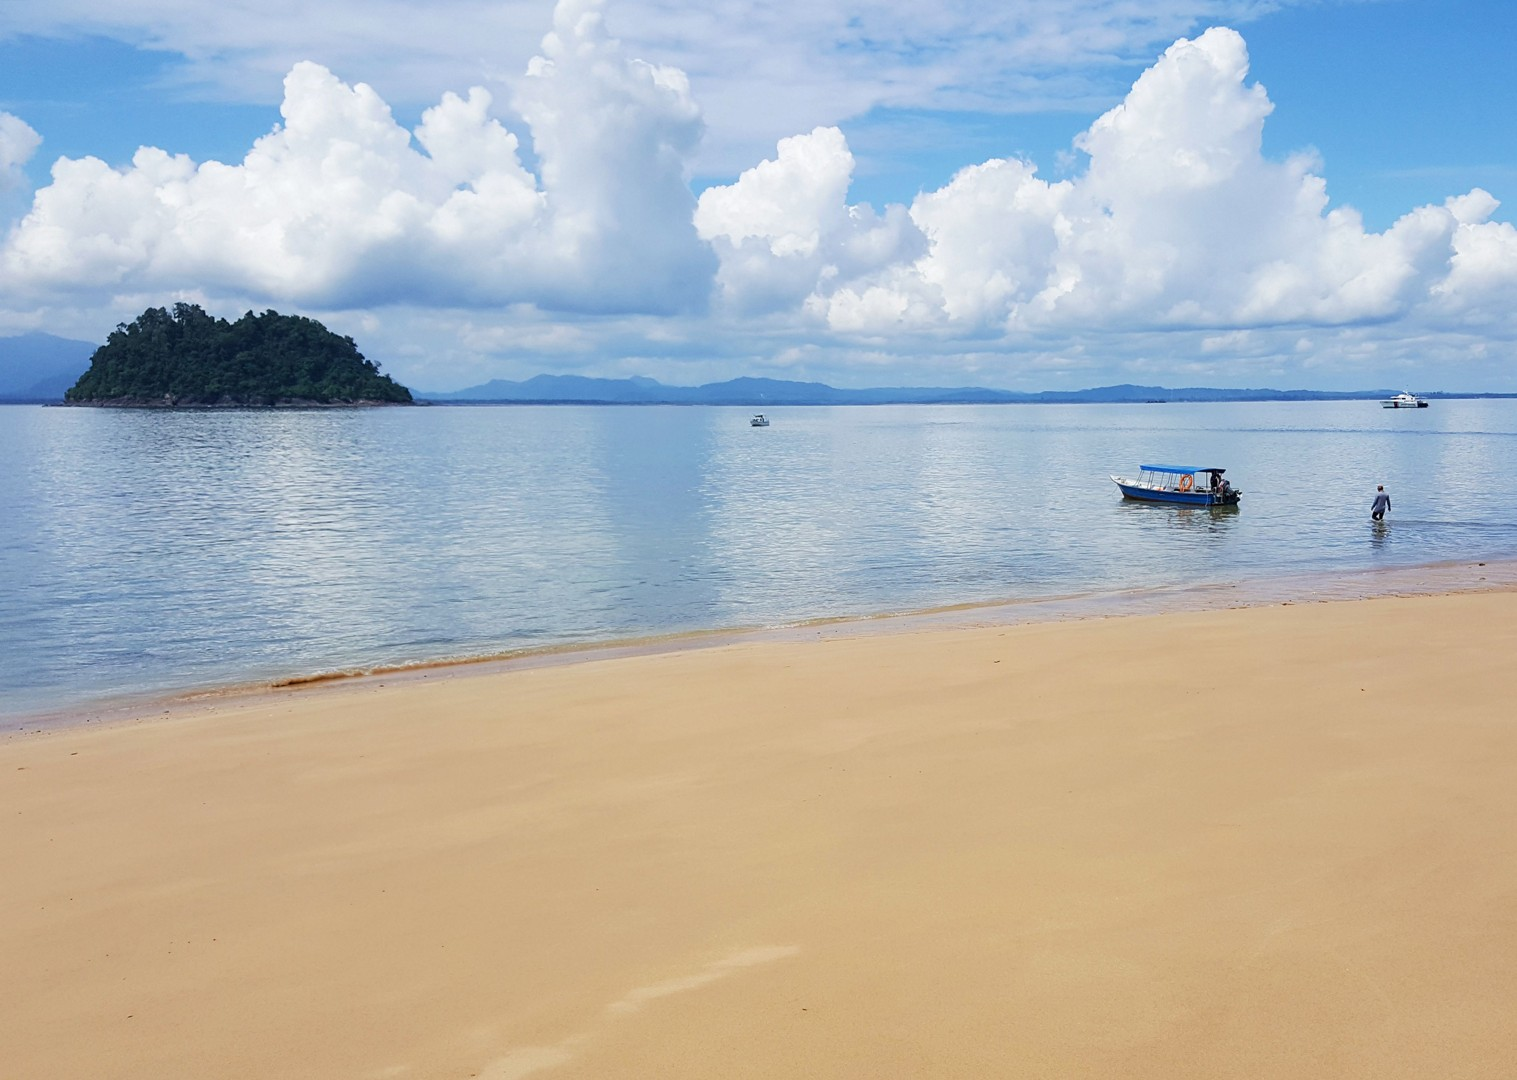 satang-island-borneo-adventure-bike.jpg - NEW! Borneo - Secret Sarawak - Cycling Adventures